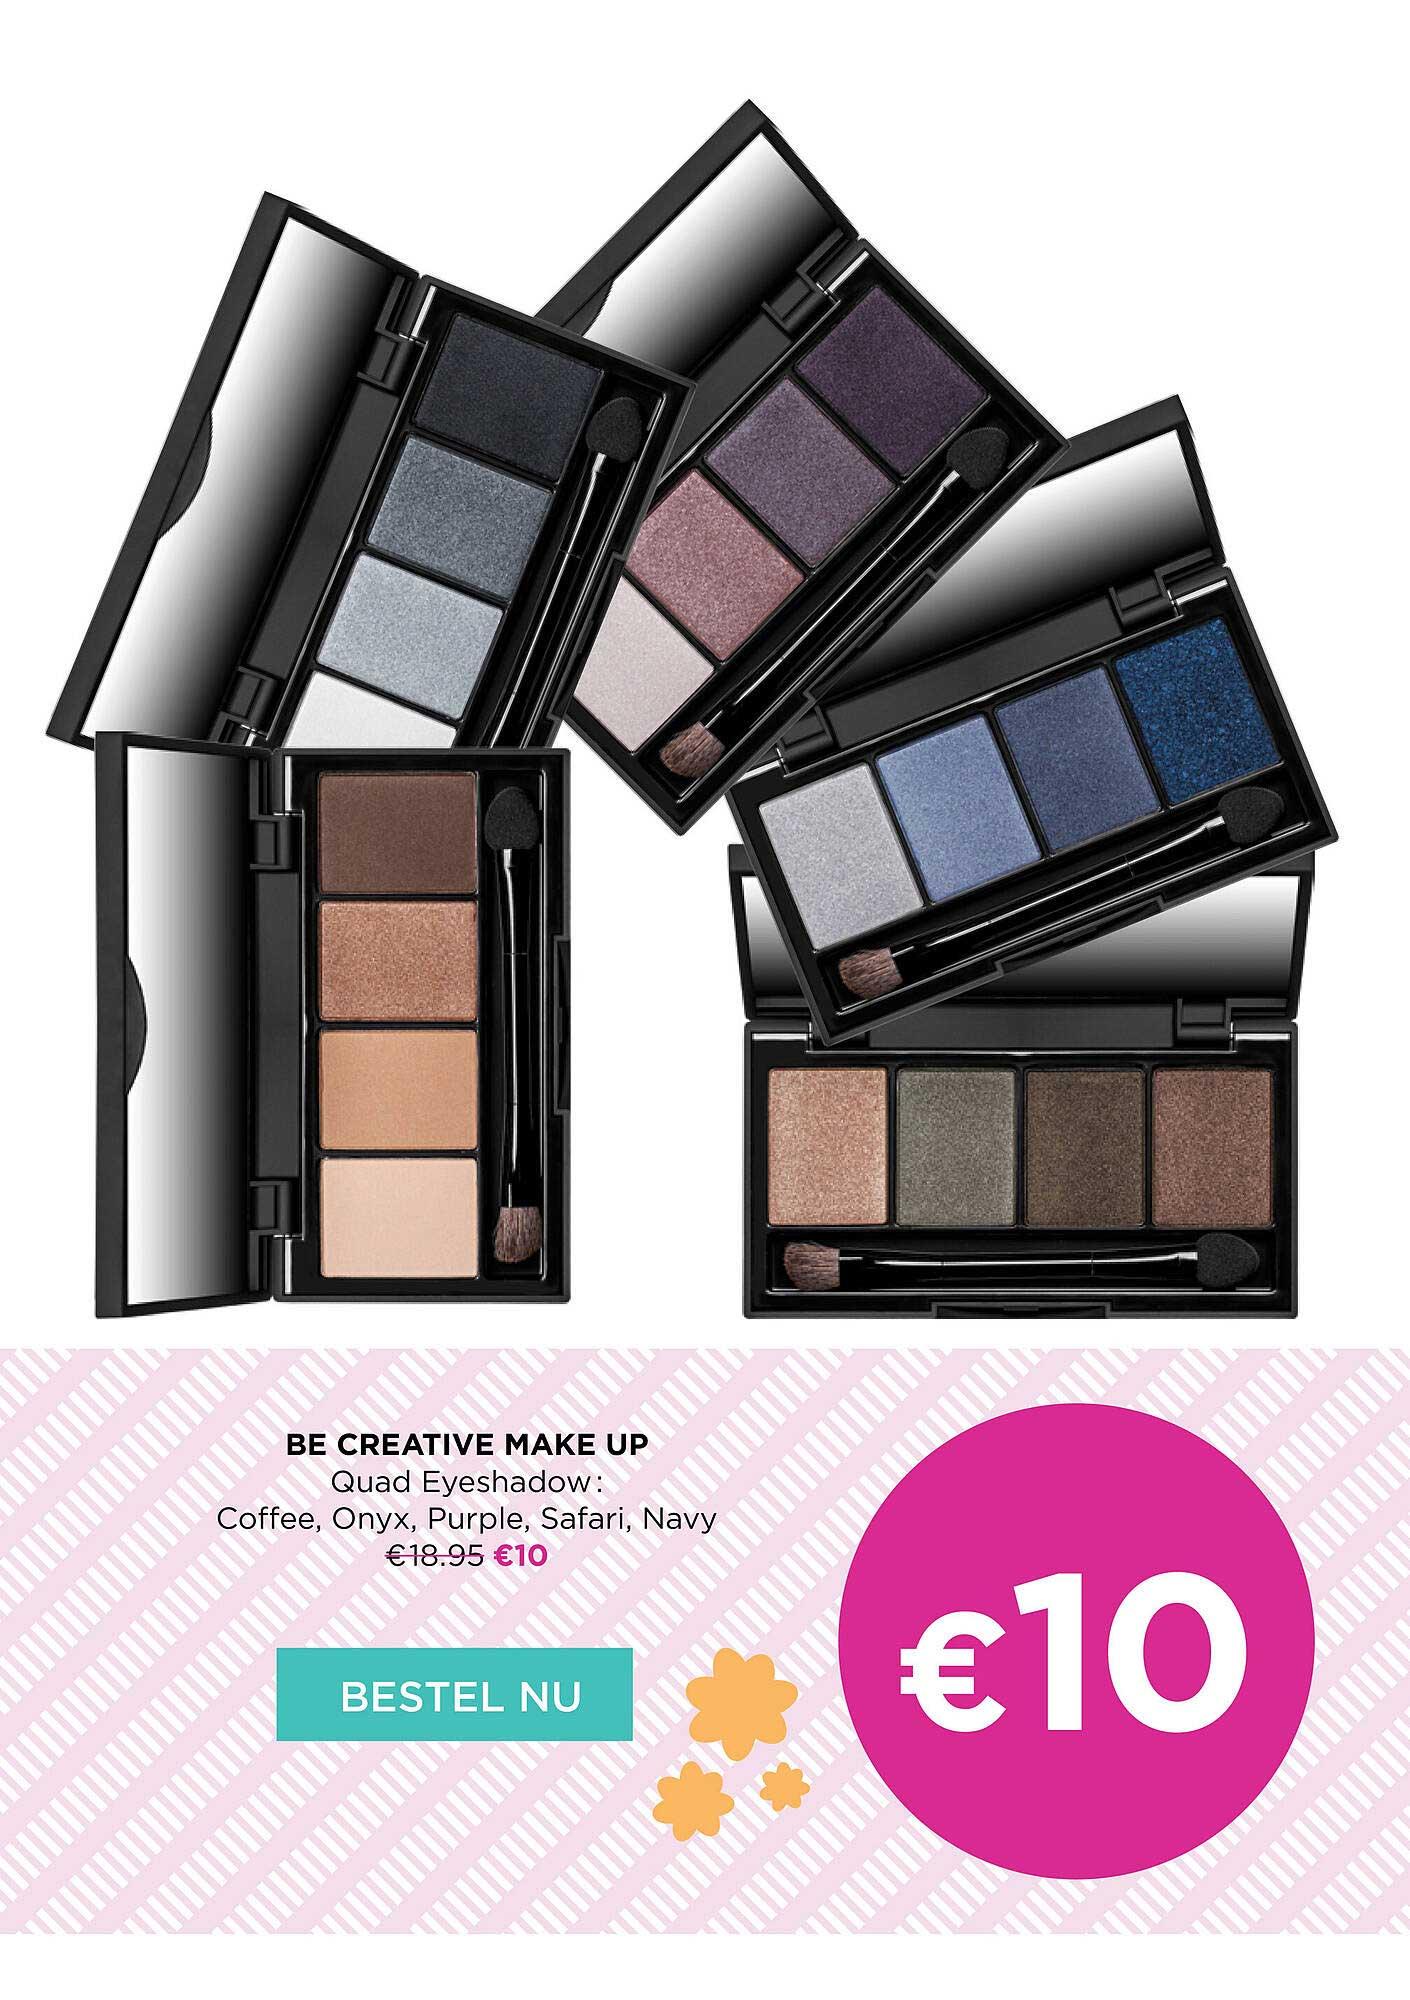 ICI PARIS XL Be Creative Make Up Quad Eyeshadow